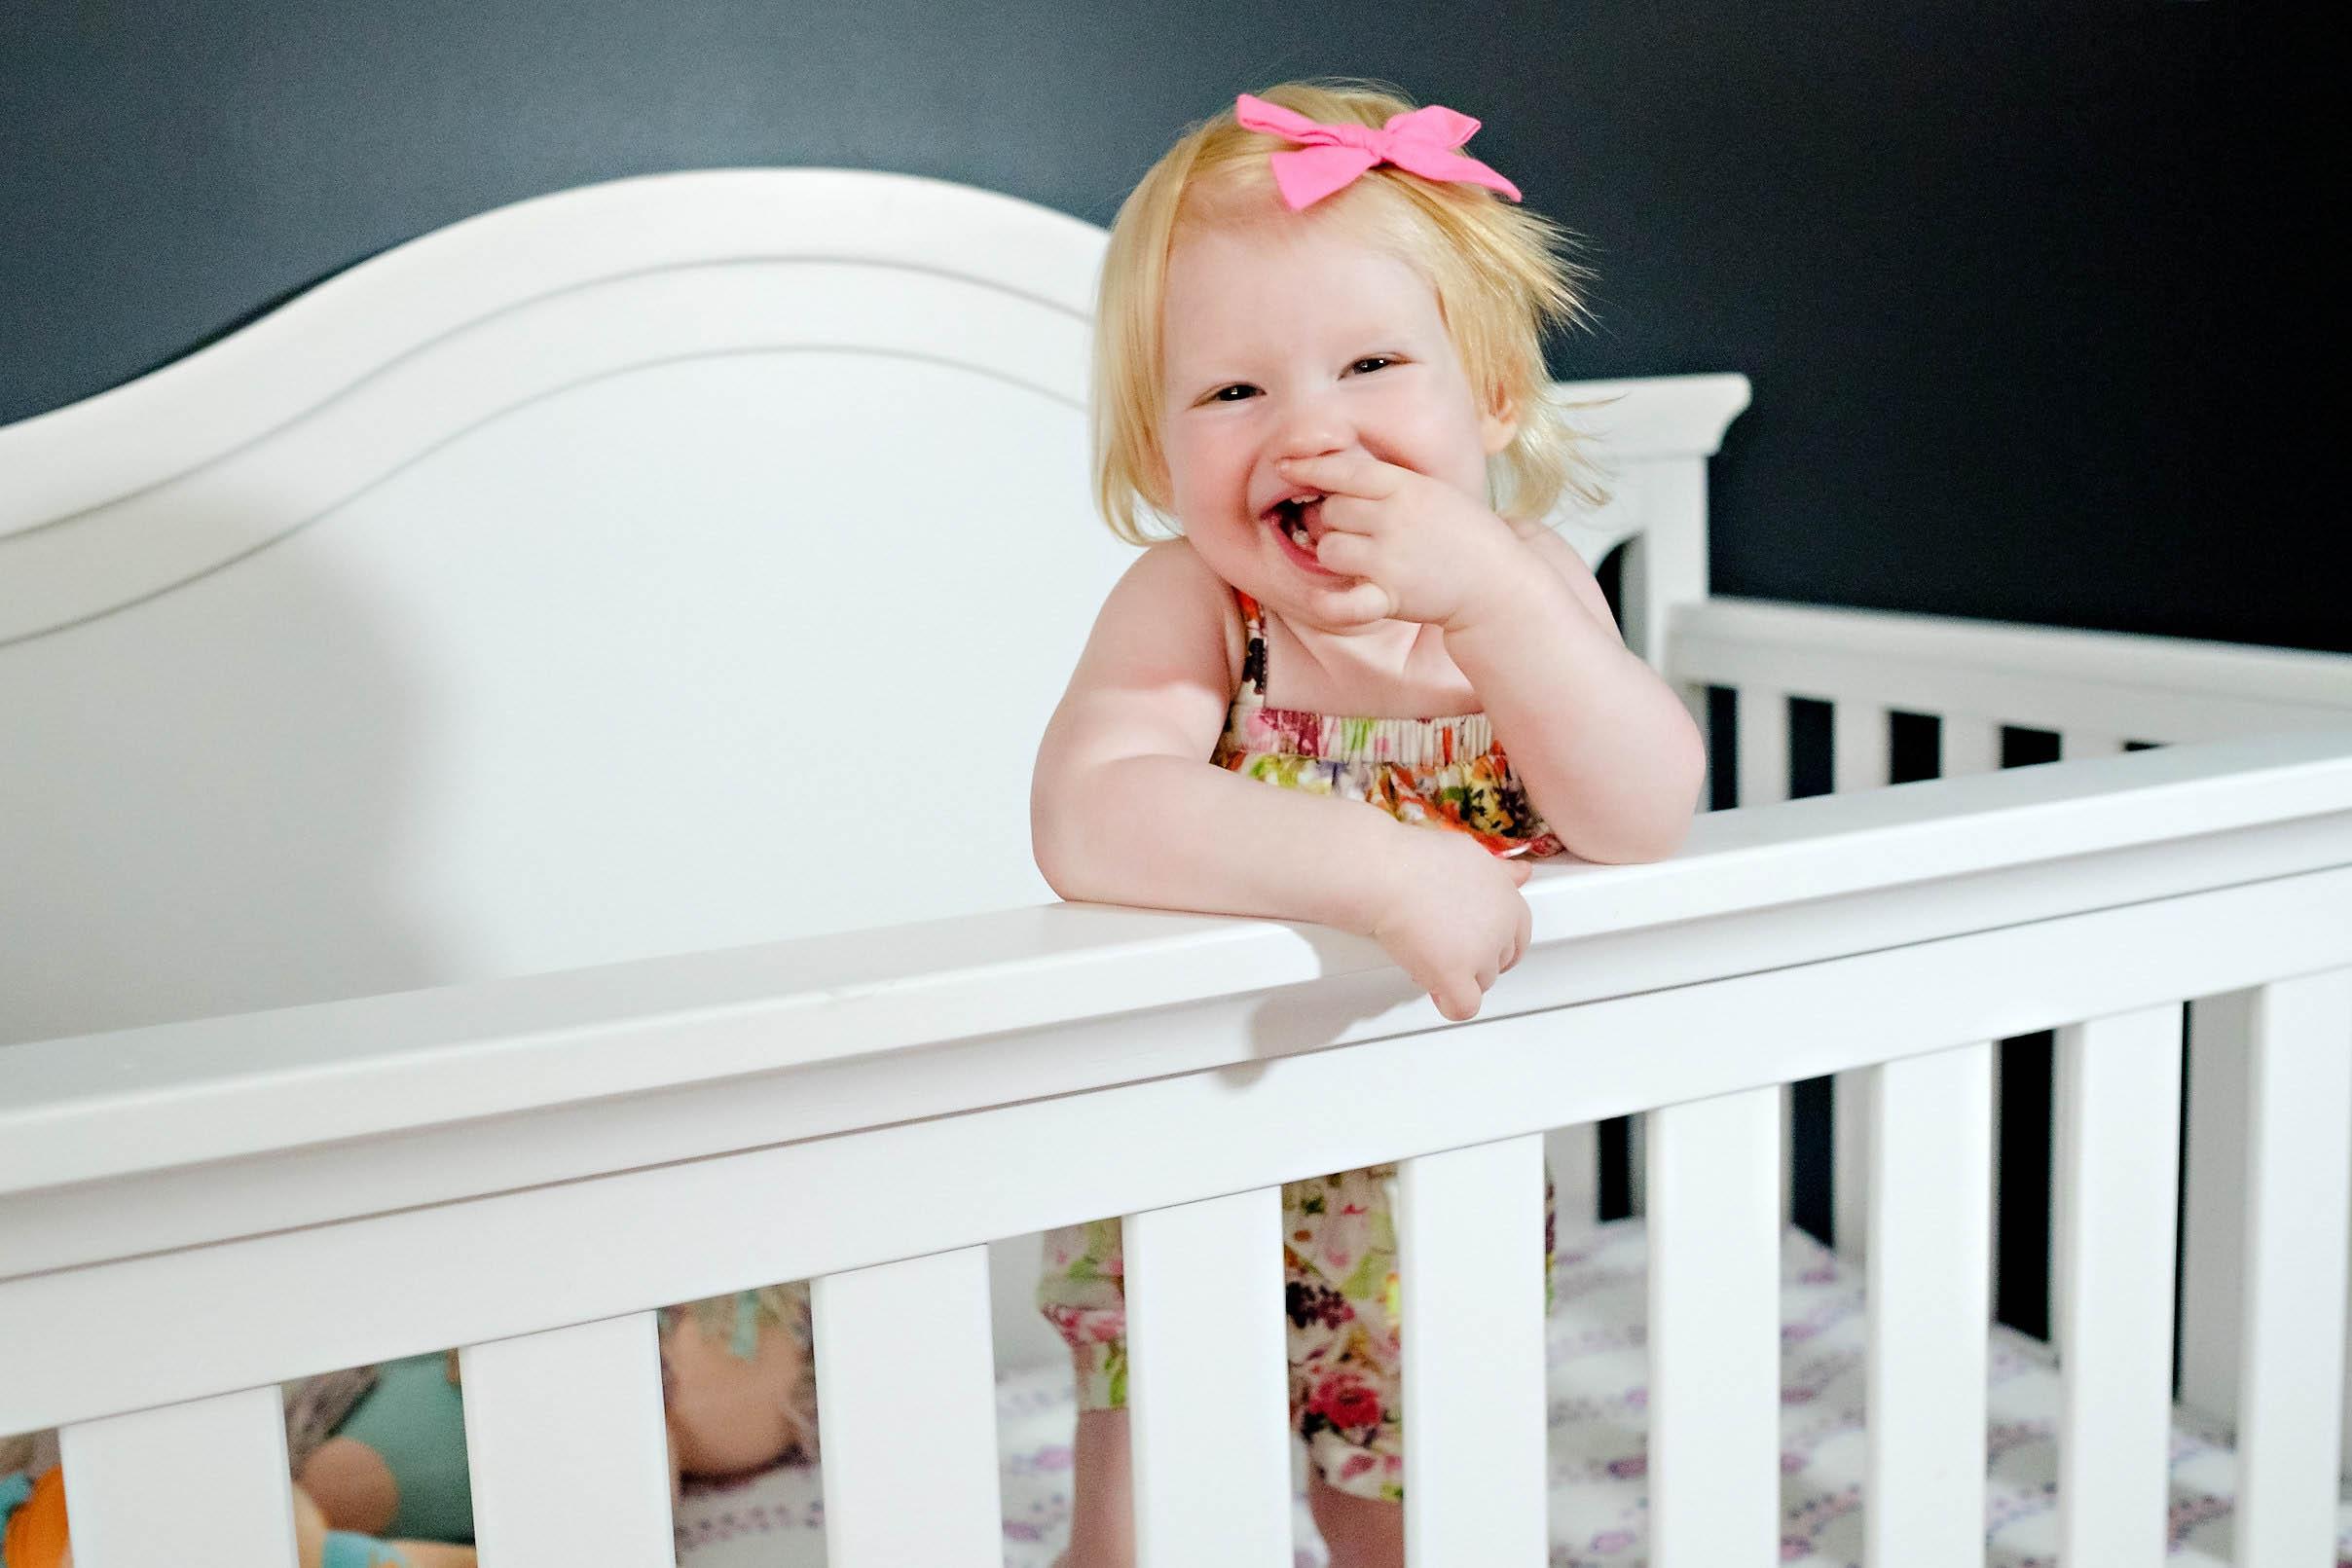 motorola toddler baby monitor - Girls Toddler Room Makeover by Atlanta mom blogger Happily Hughes